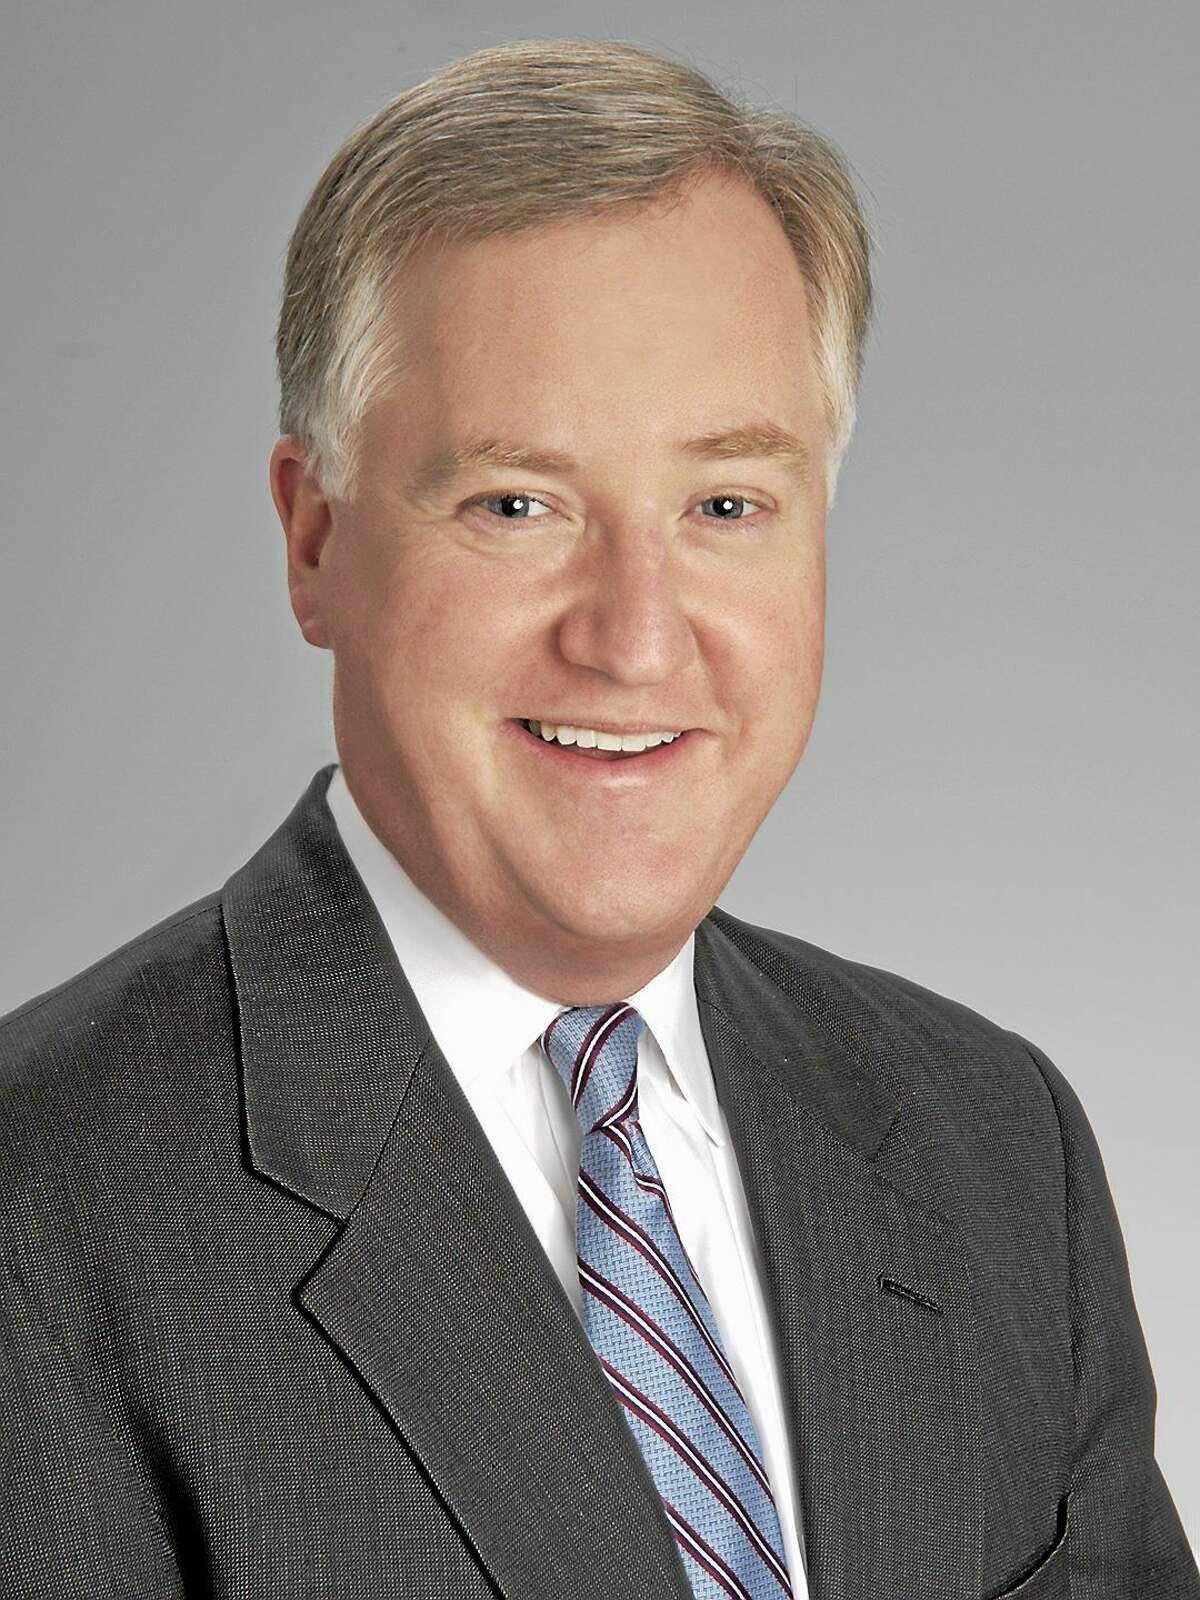 Connecticut Speaker of the House Brendan Sharkey, D-Hamden